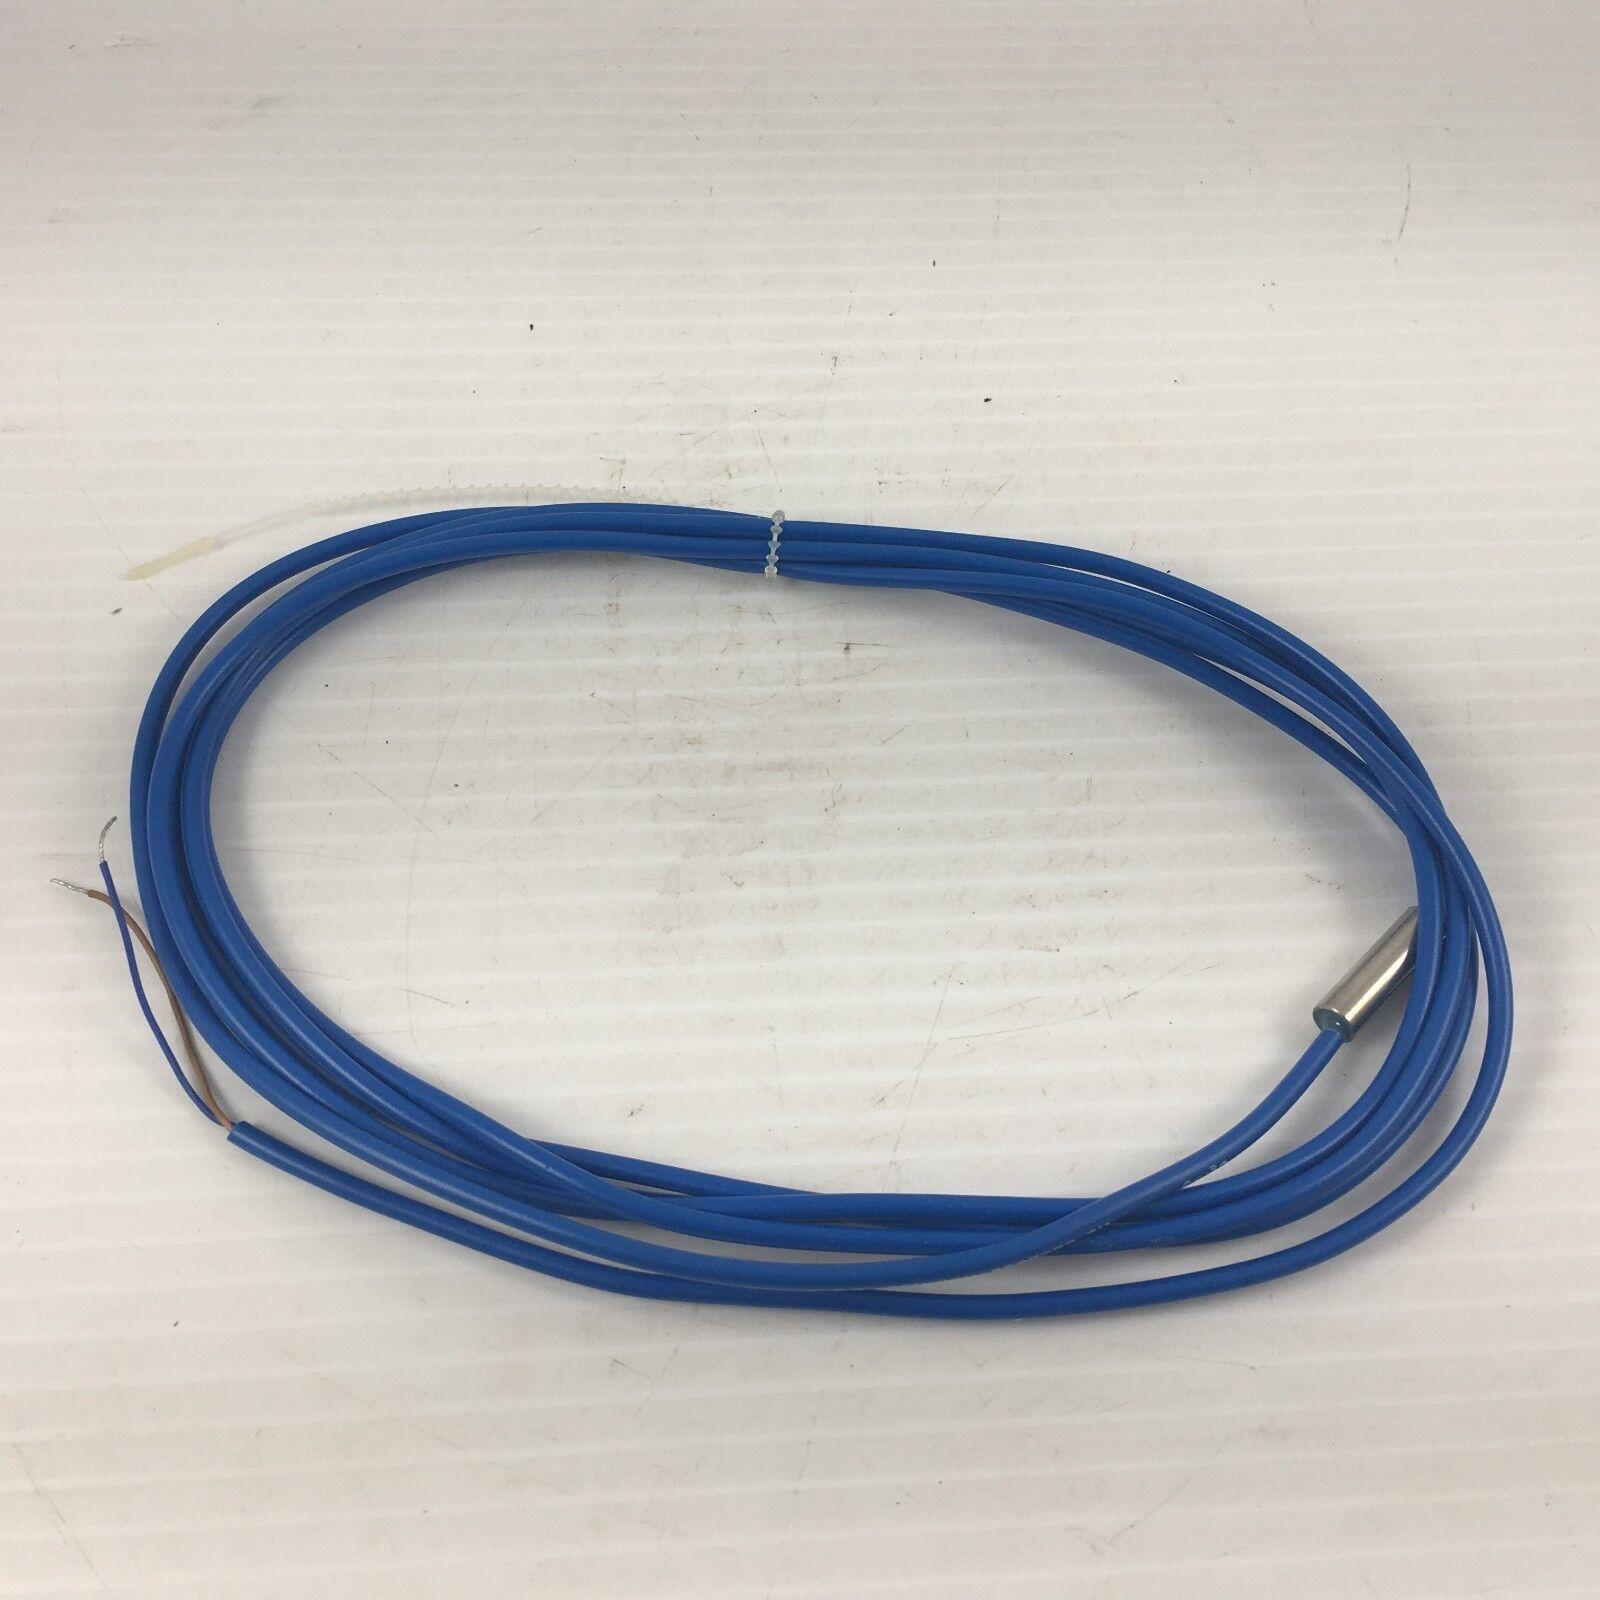 New Pepperl + Fuchs NJ-1.5-6.5N Proximity Sensor, 01828S